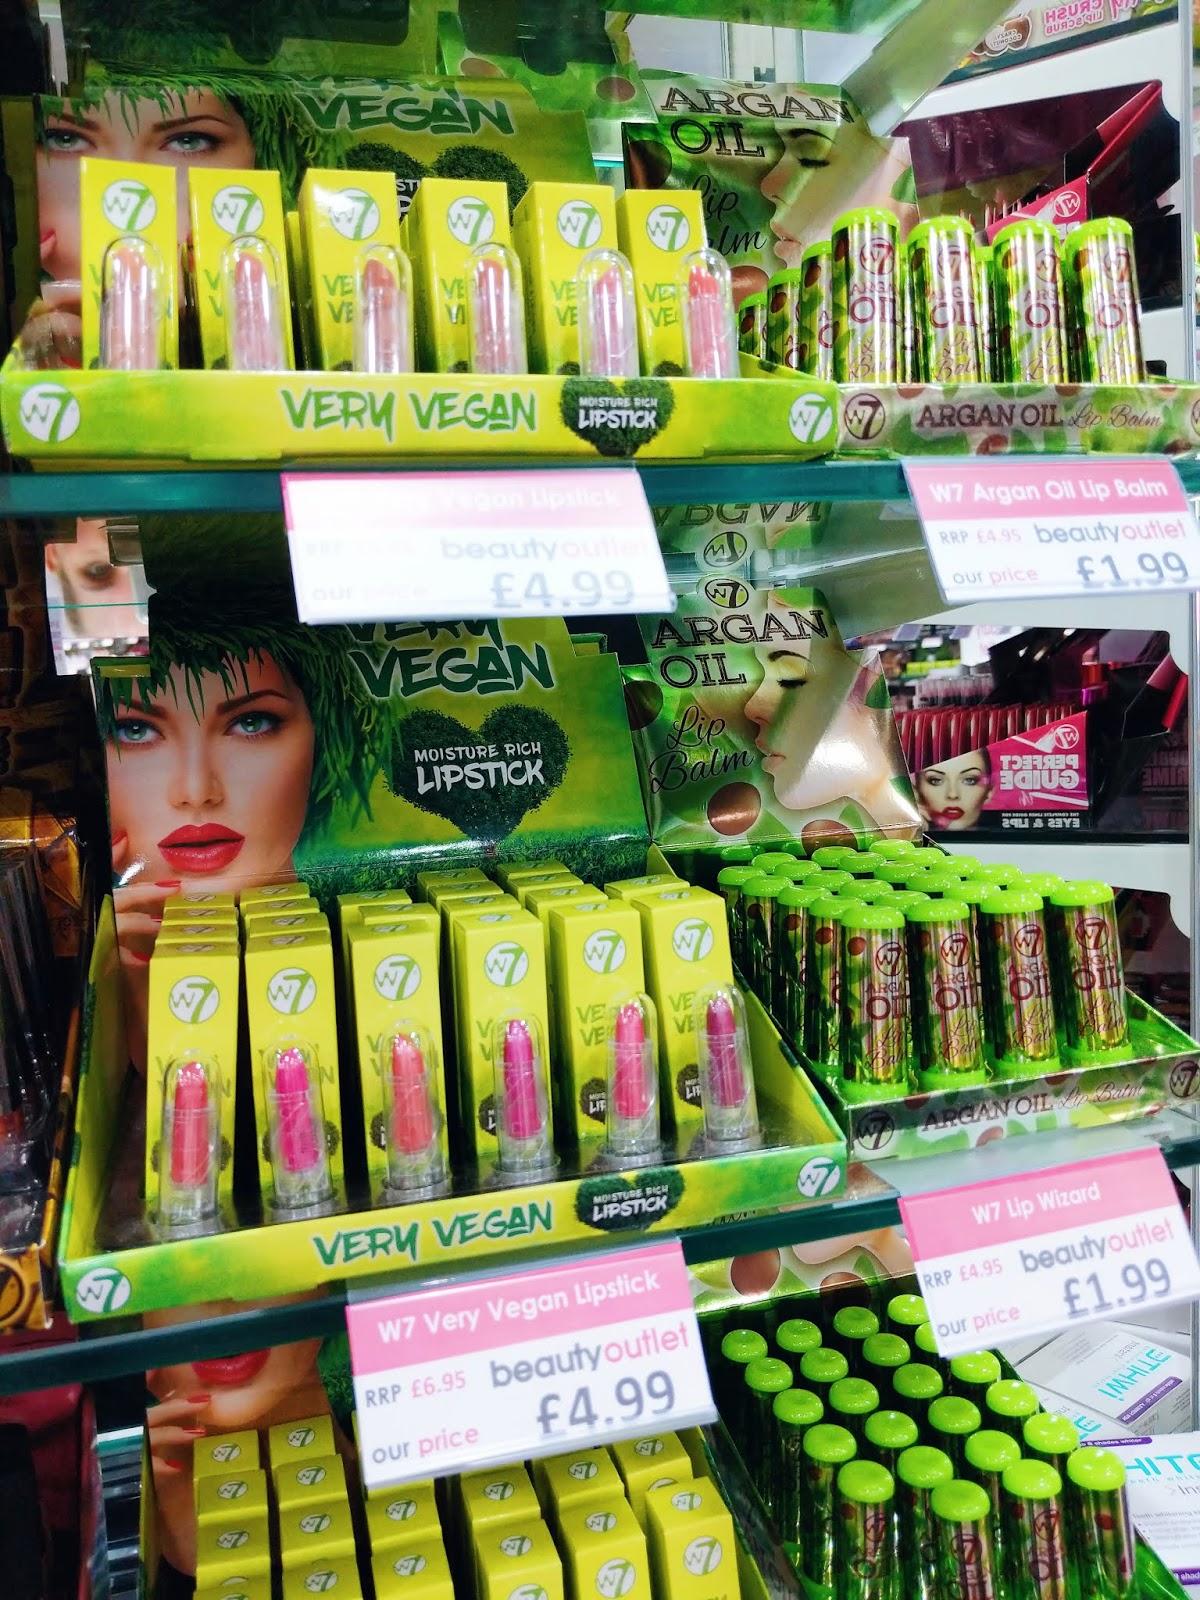 W7_Cosmetics_Vegan_Lipsticks